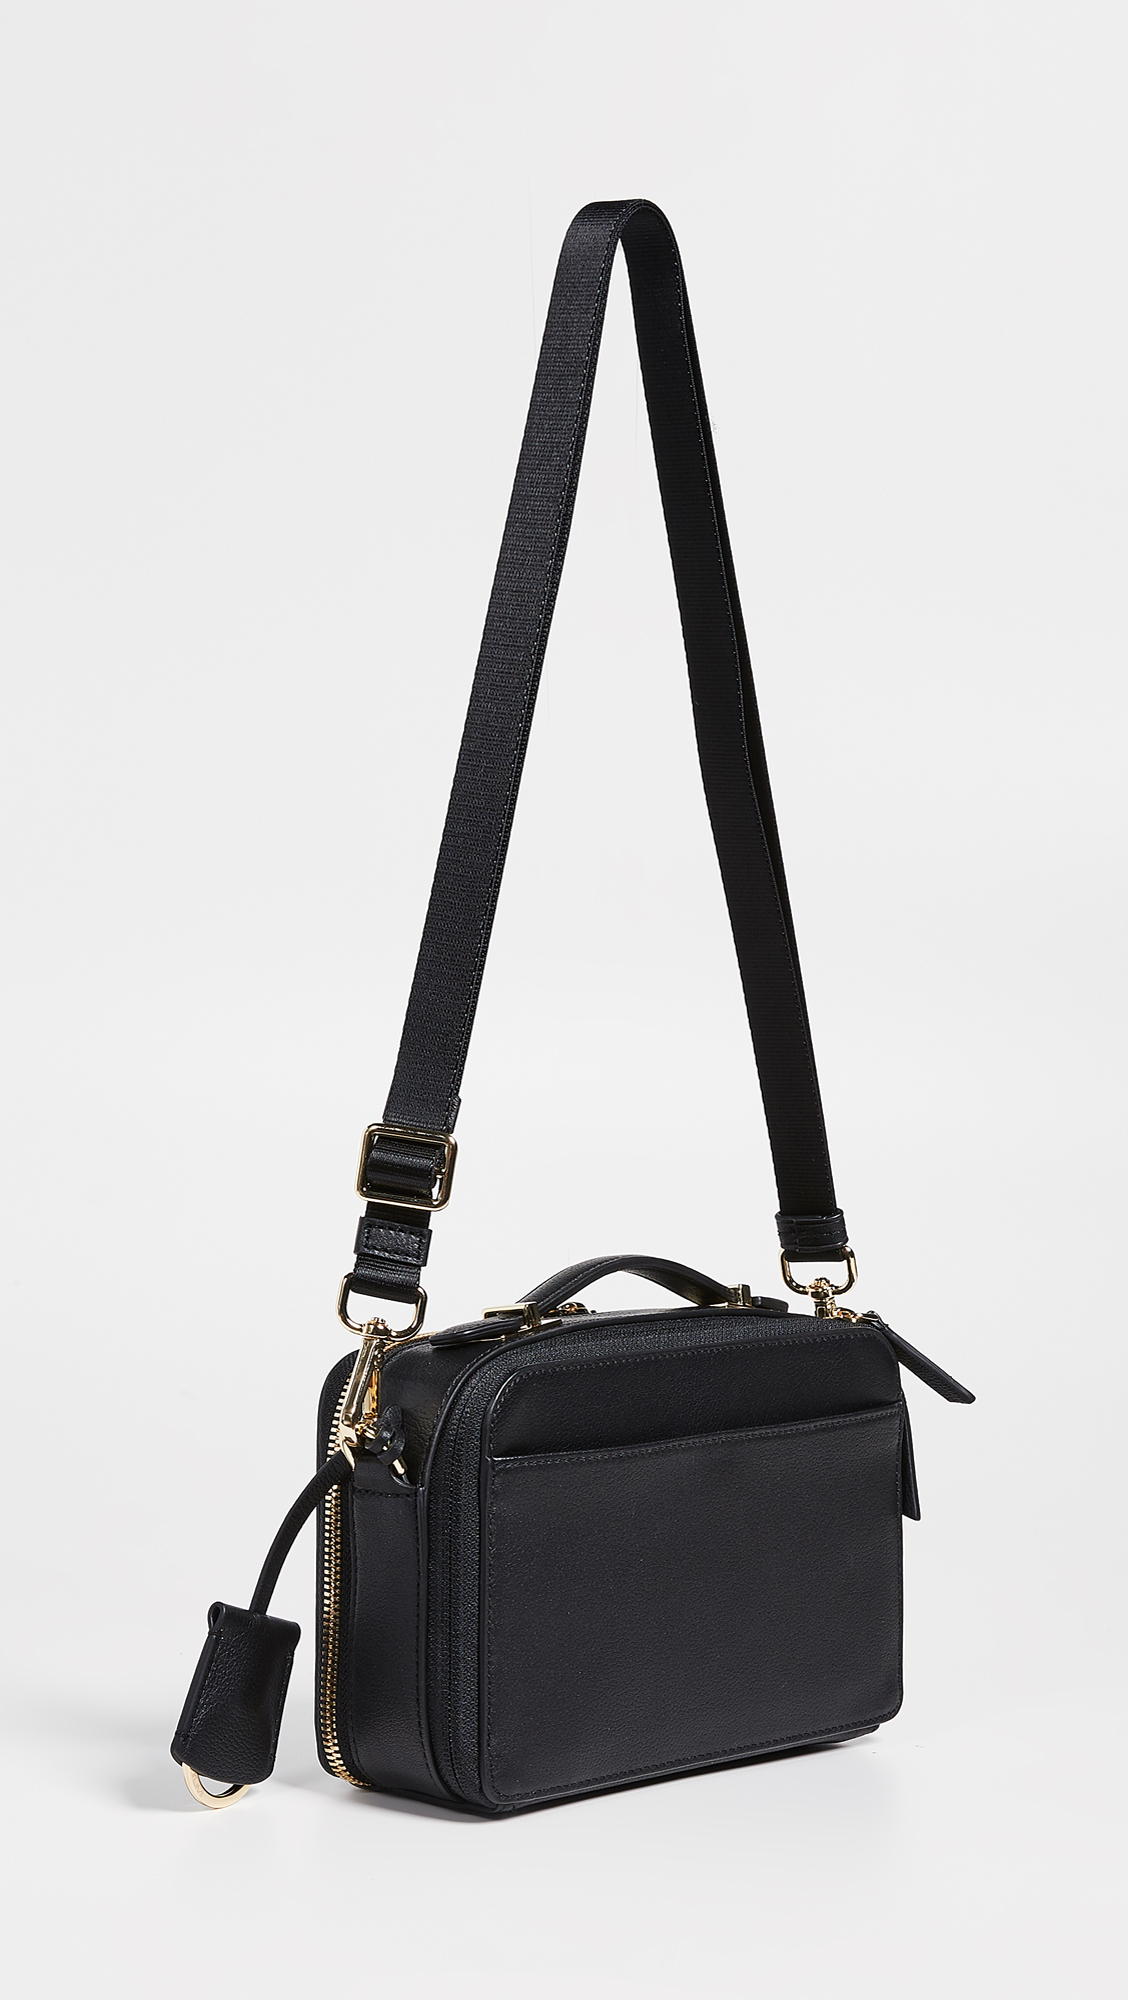 710eee5135 Tumi Voyageur Aberdeen Crossbody Bag